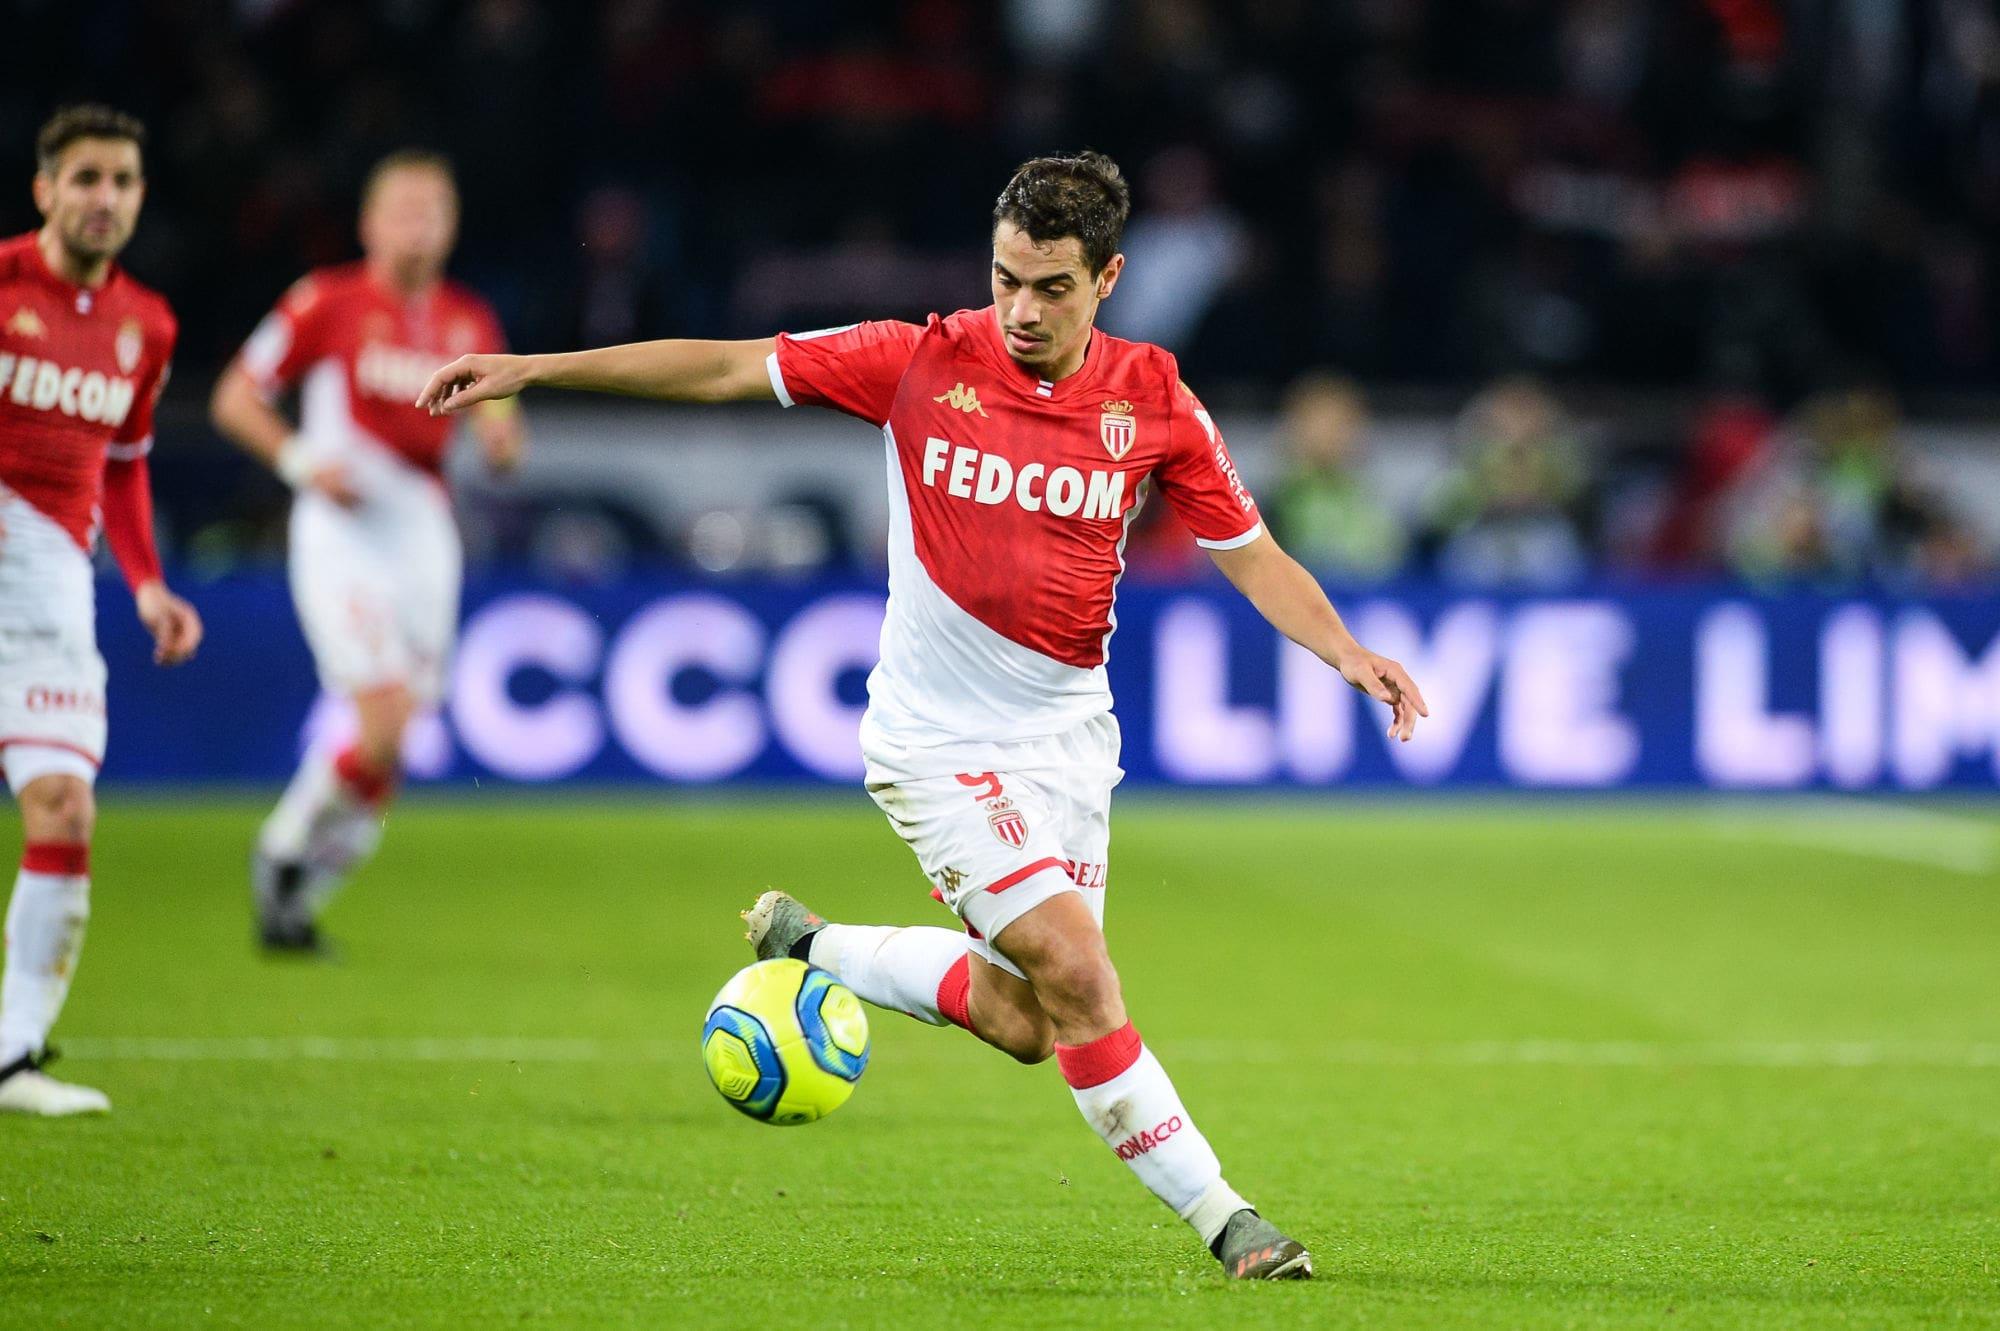 Monaco vs Angers Sco Free Betting Predictions